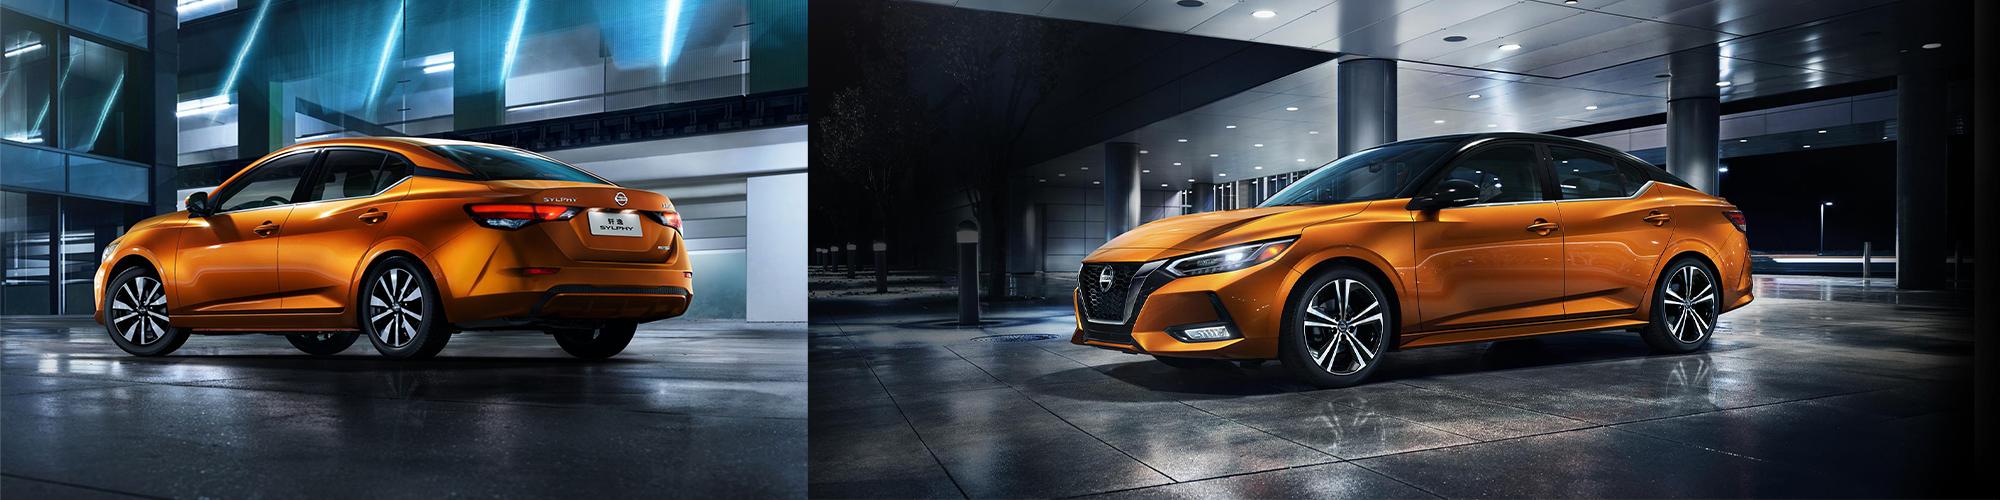 2020 Nissan Sentra For Sale